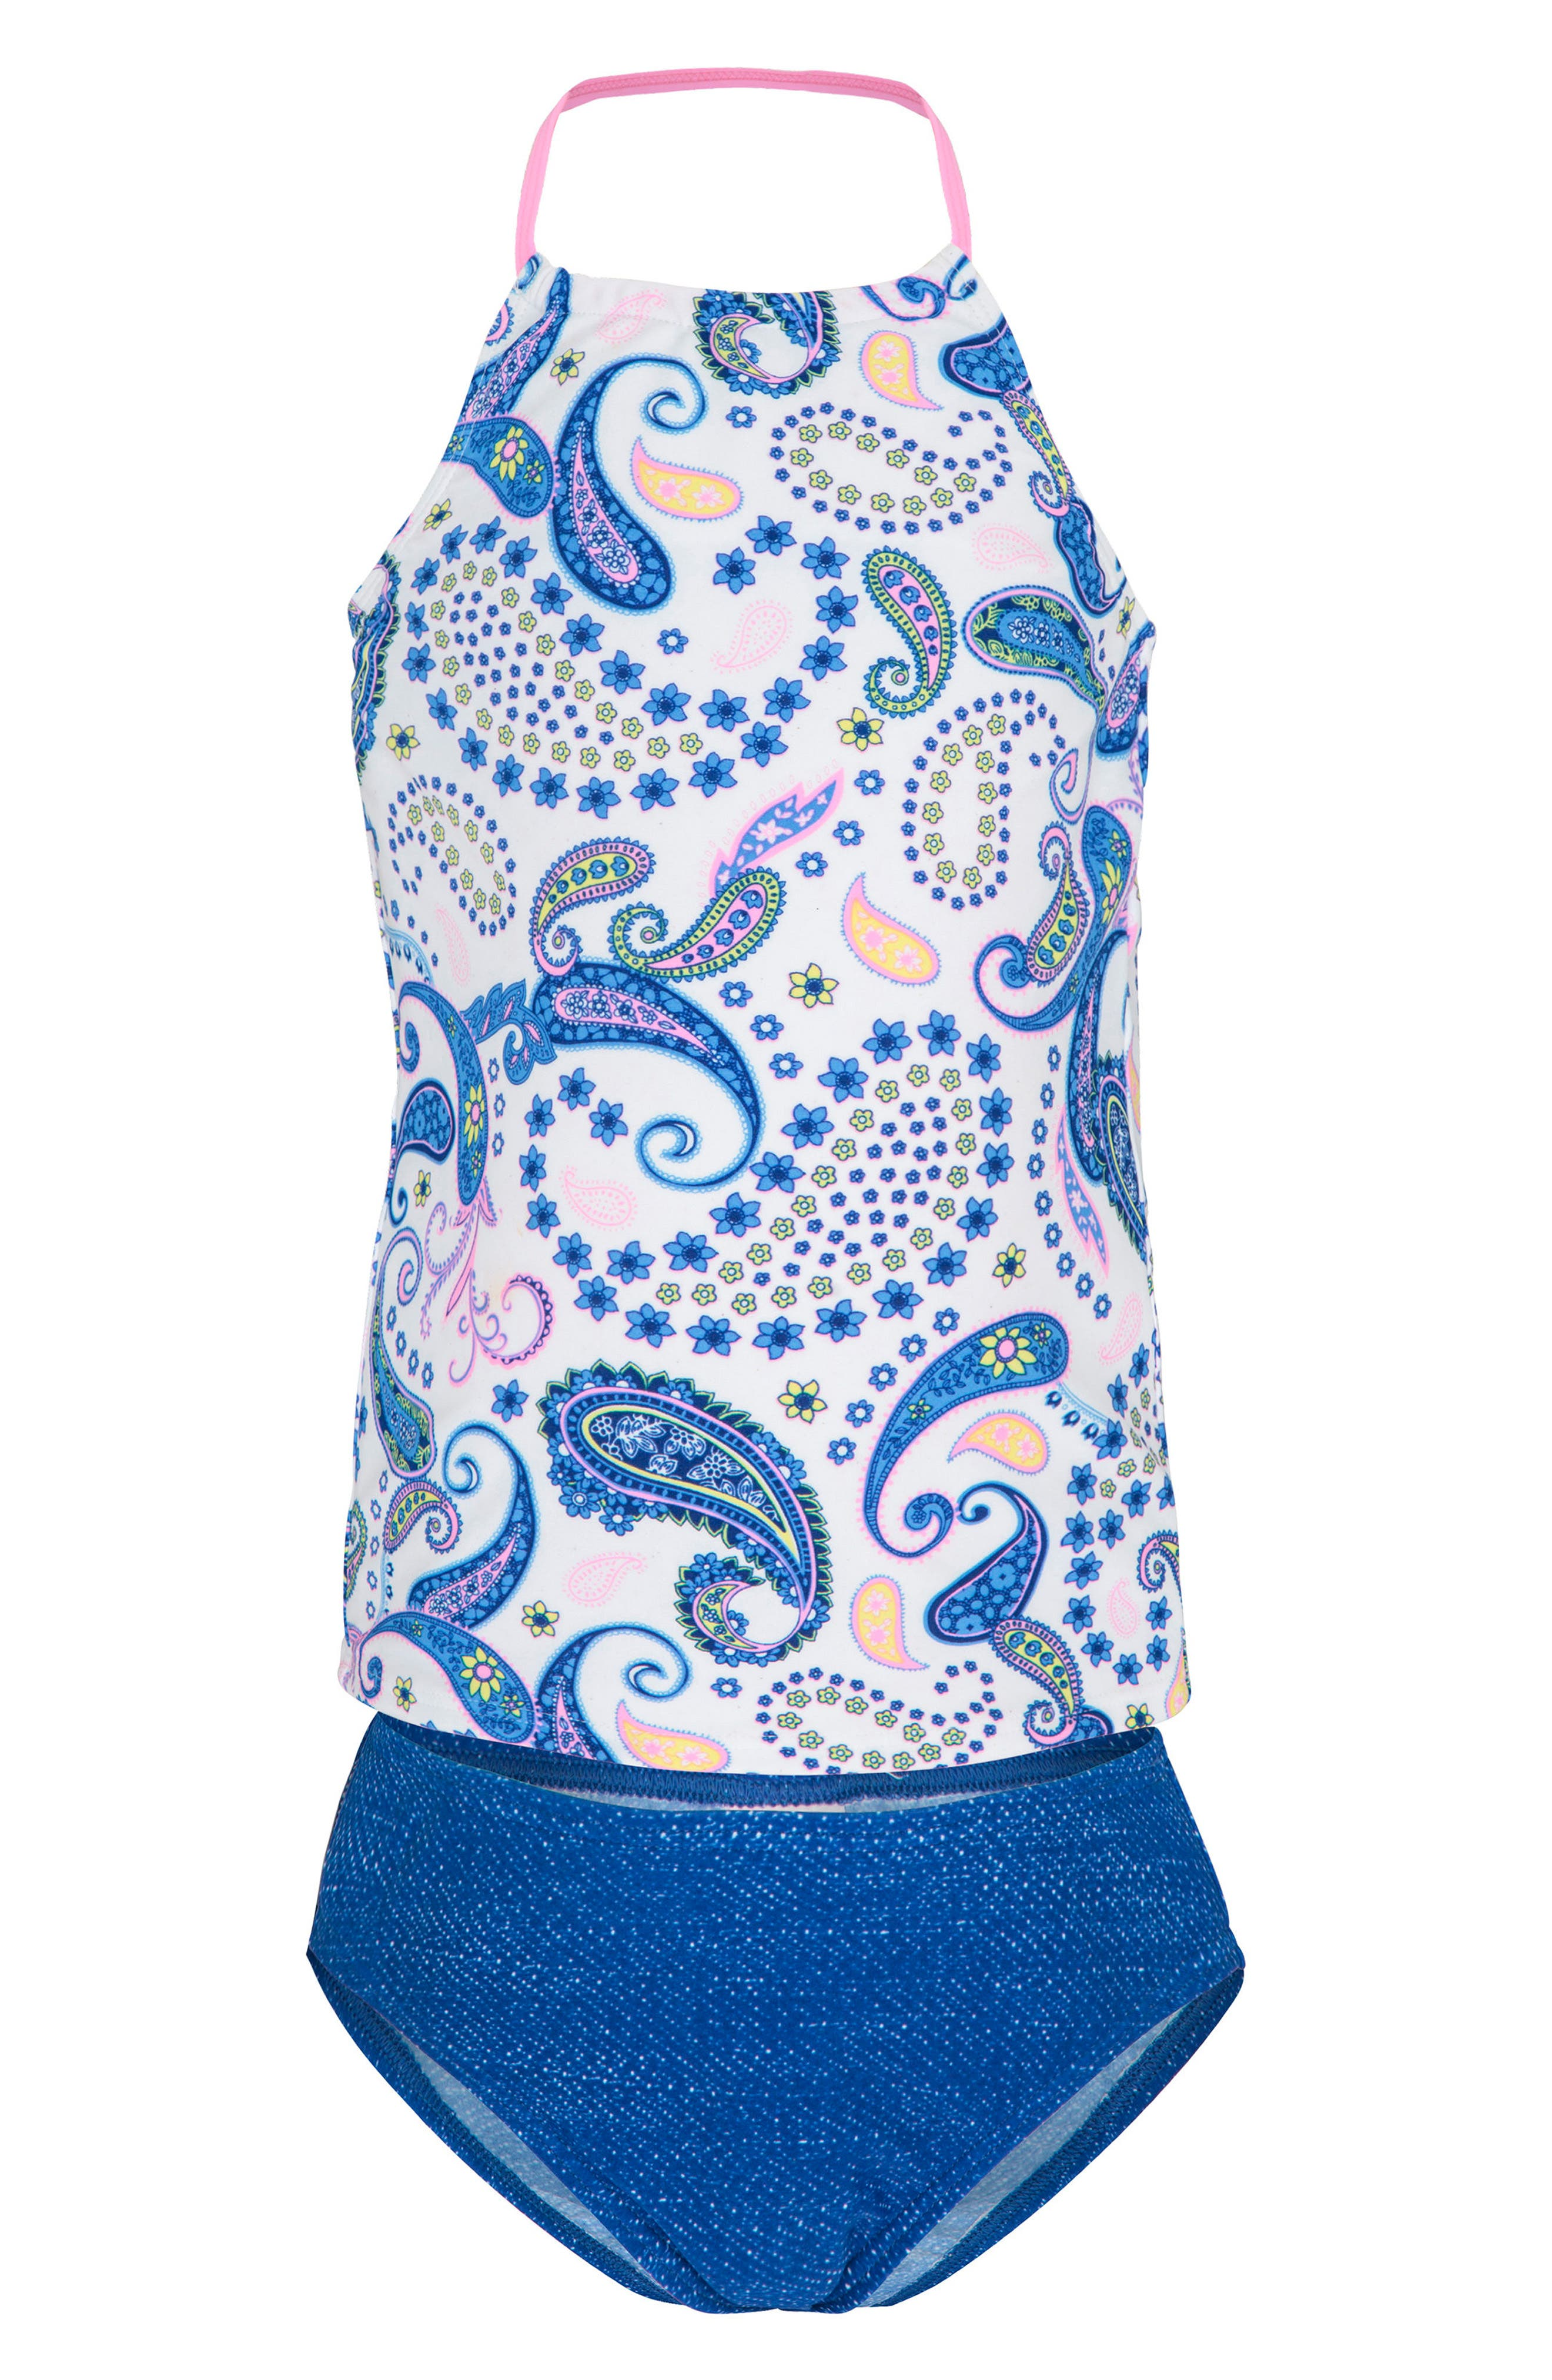 Two-Piece Tankini Swimsuit,                             Main thumbnail 1, color,                             Boho Paisley